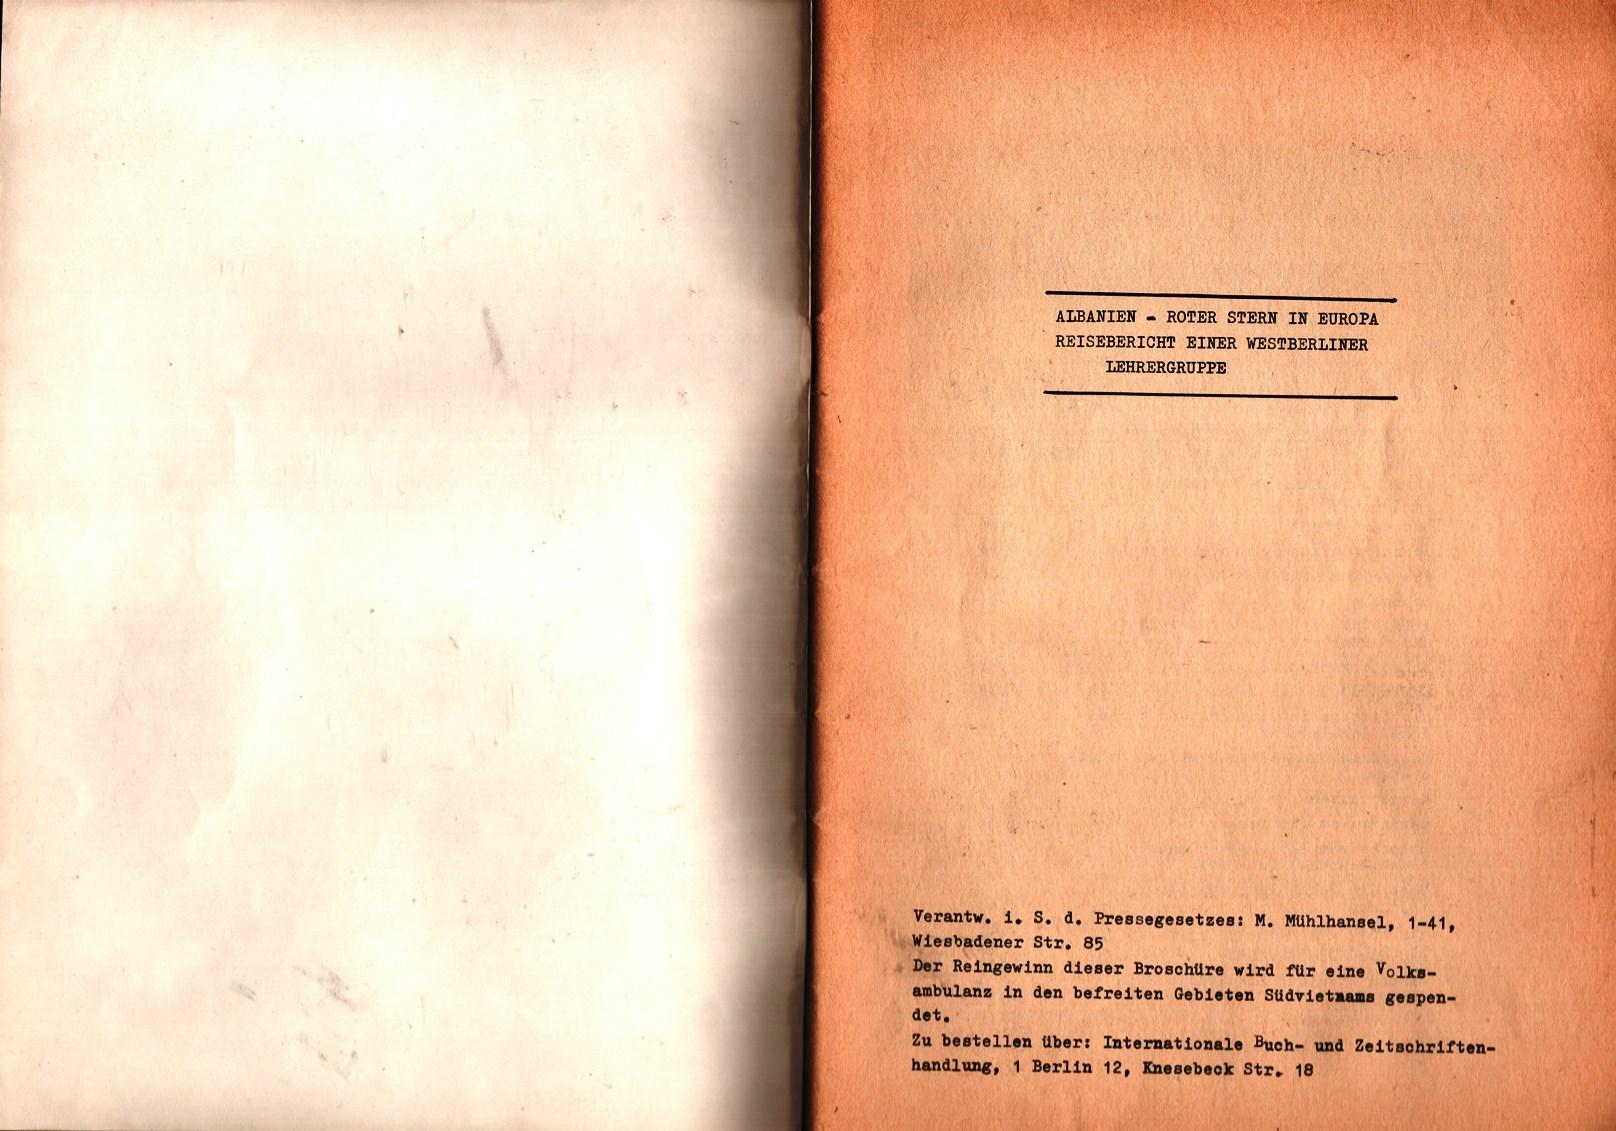 Berlin_1974_Reisebericht_Albanien_002